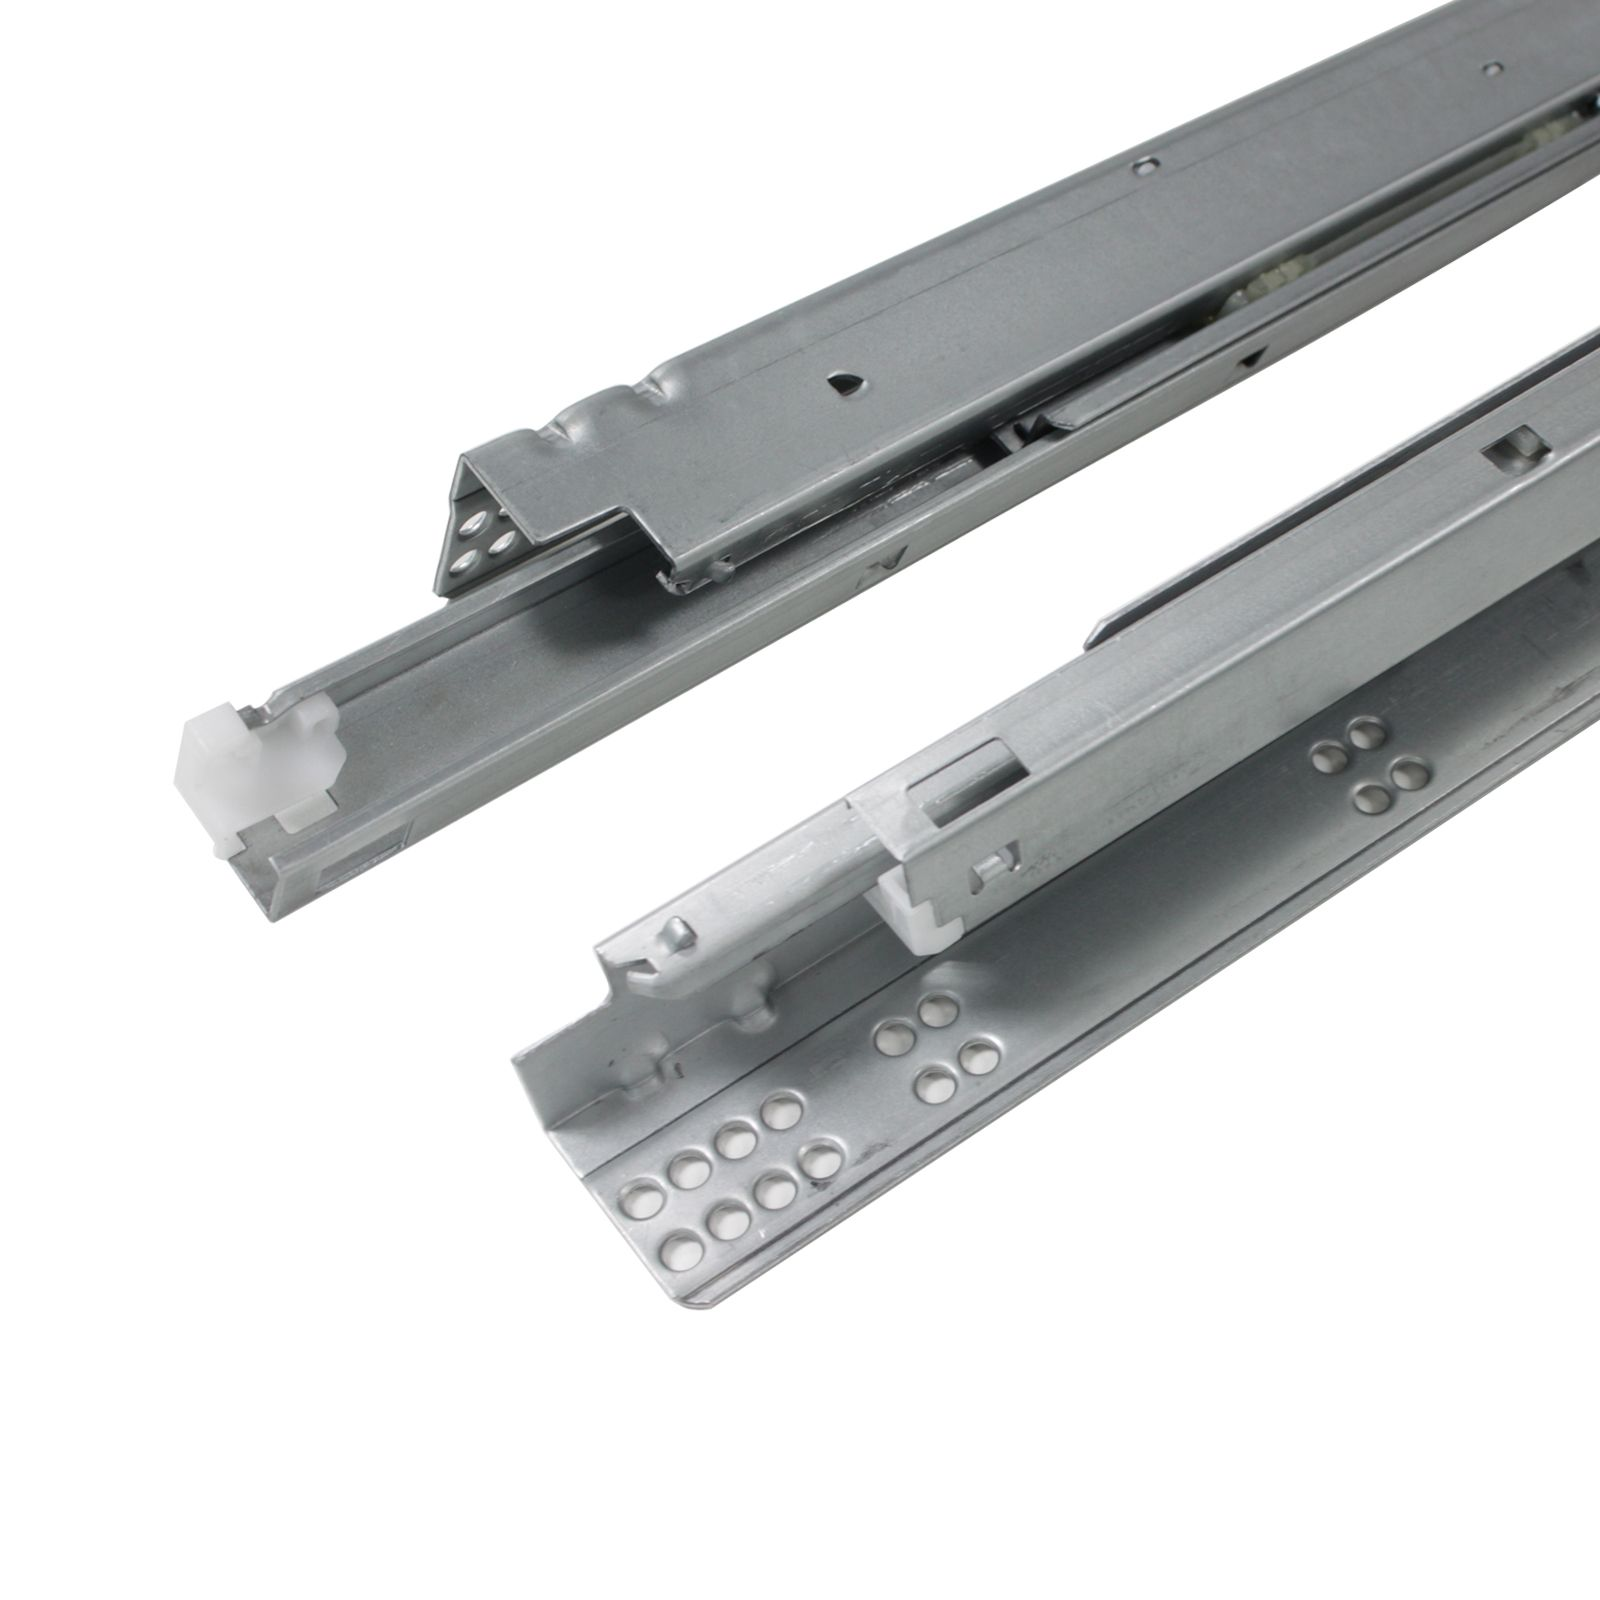 TCH Hardware 2 x 16 Inch 100 LB Steel Full Extension Ball Bearing Drawer Slides Kitchen Cabinet Desk Draw